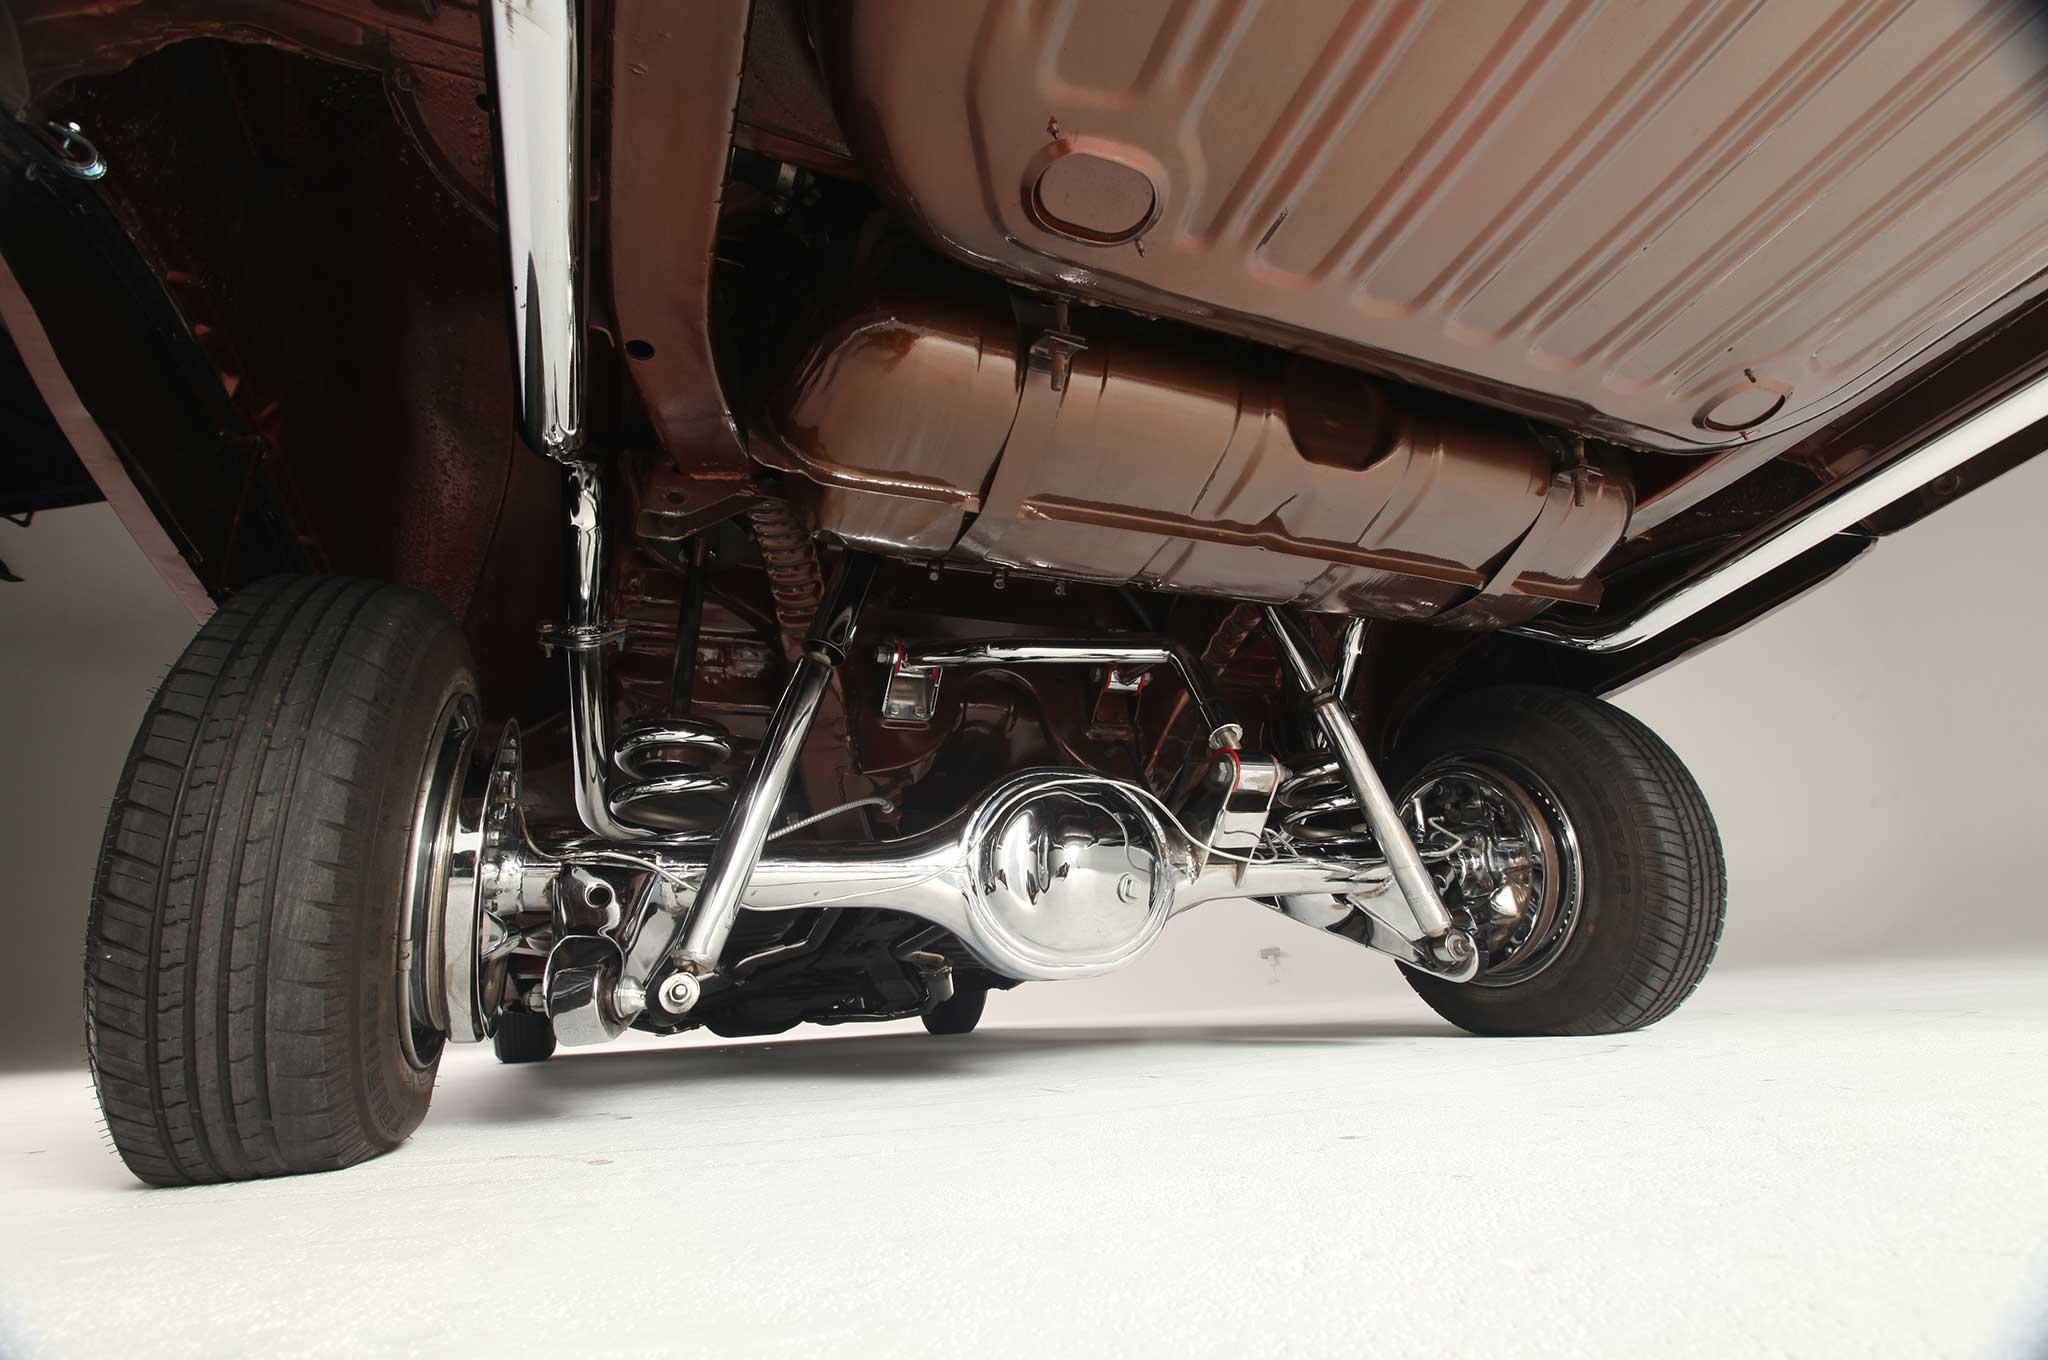 1964 Chevrolet Impala Brown Eyed Girl Lowrider